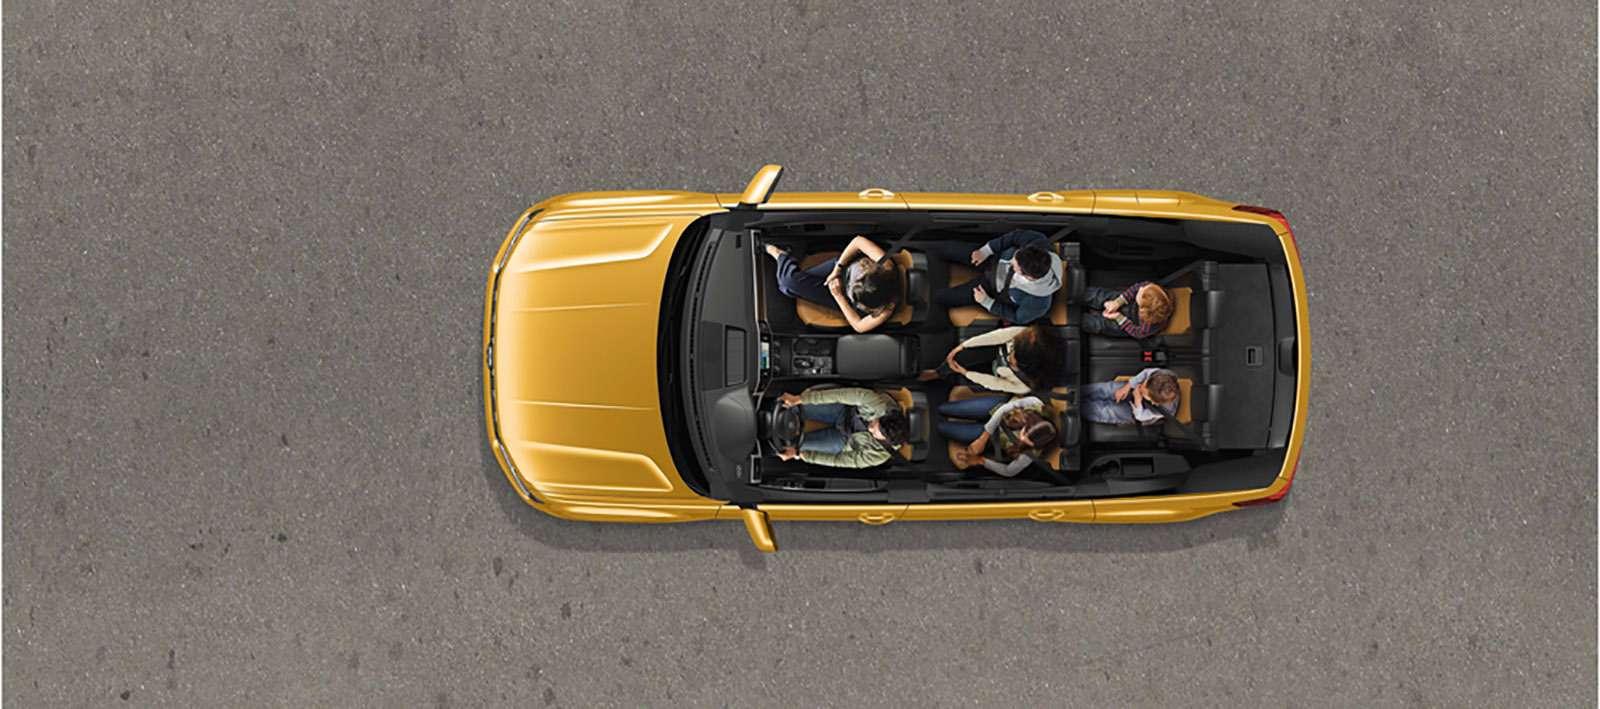 Volkswagen Teramont: оноказался дешевле конкурентов— фото 852960